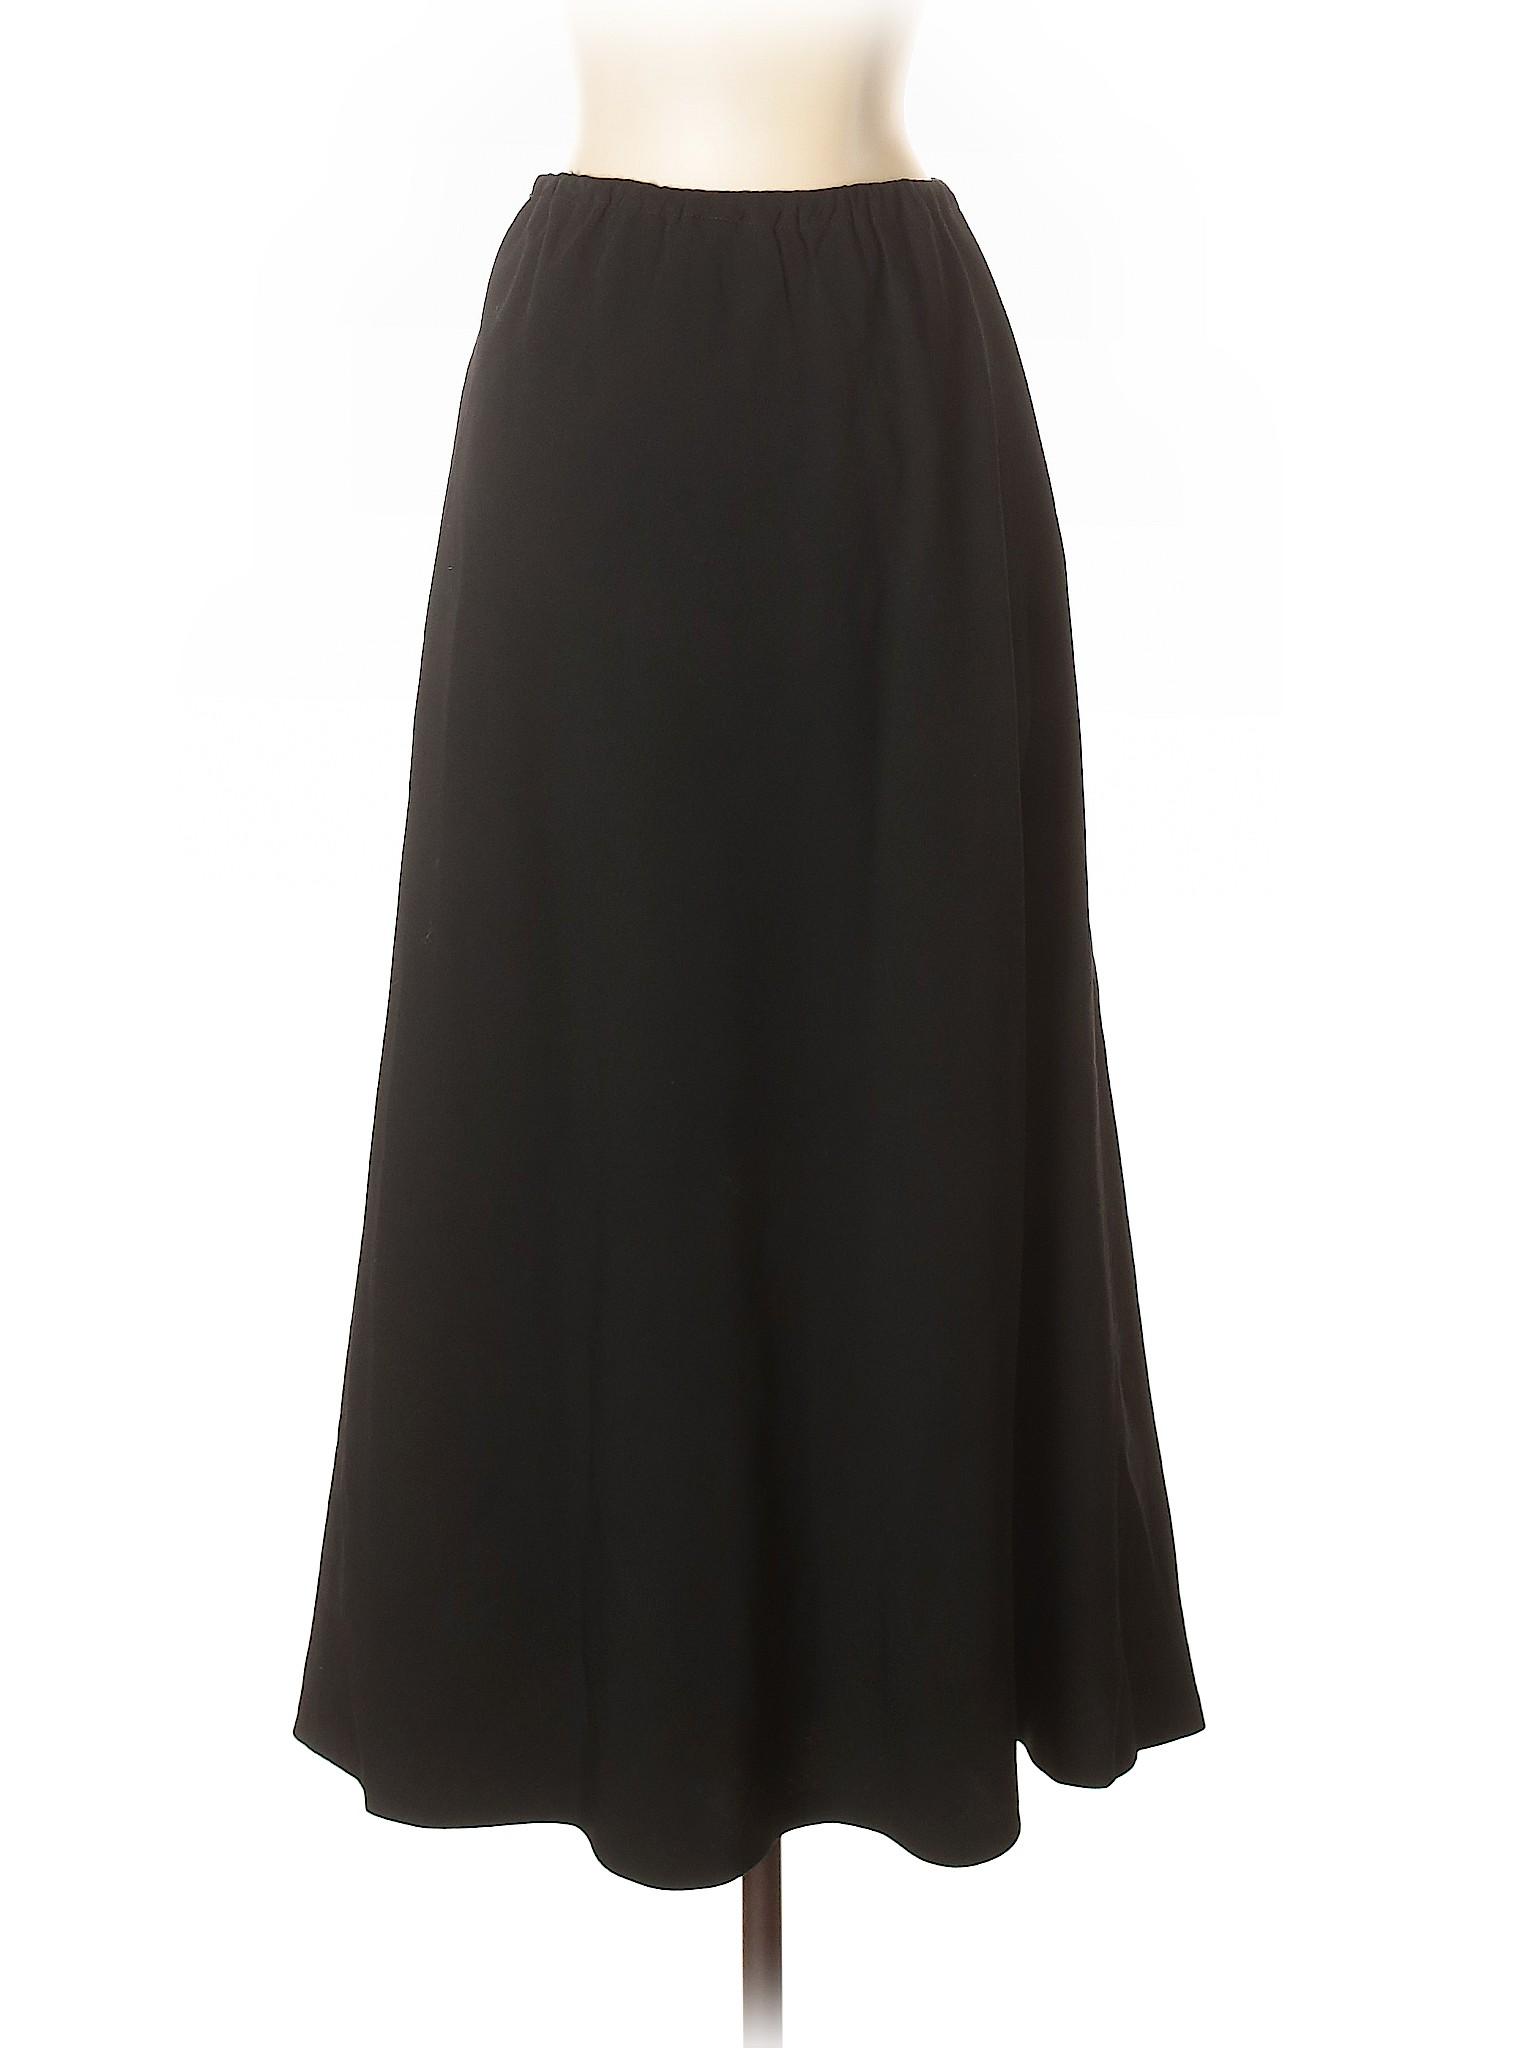 leisure Wool Collection Boutique Skirt Klein Calvin 1q0xdwxa